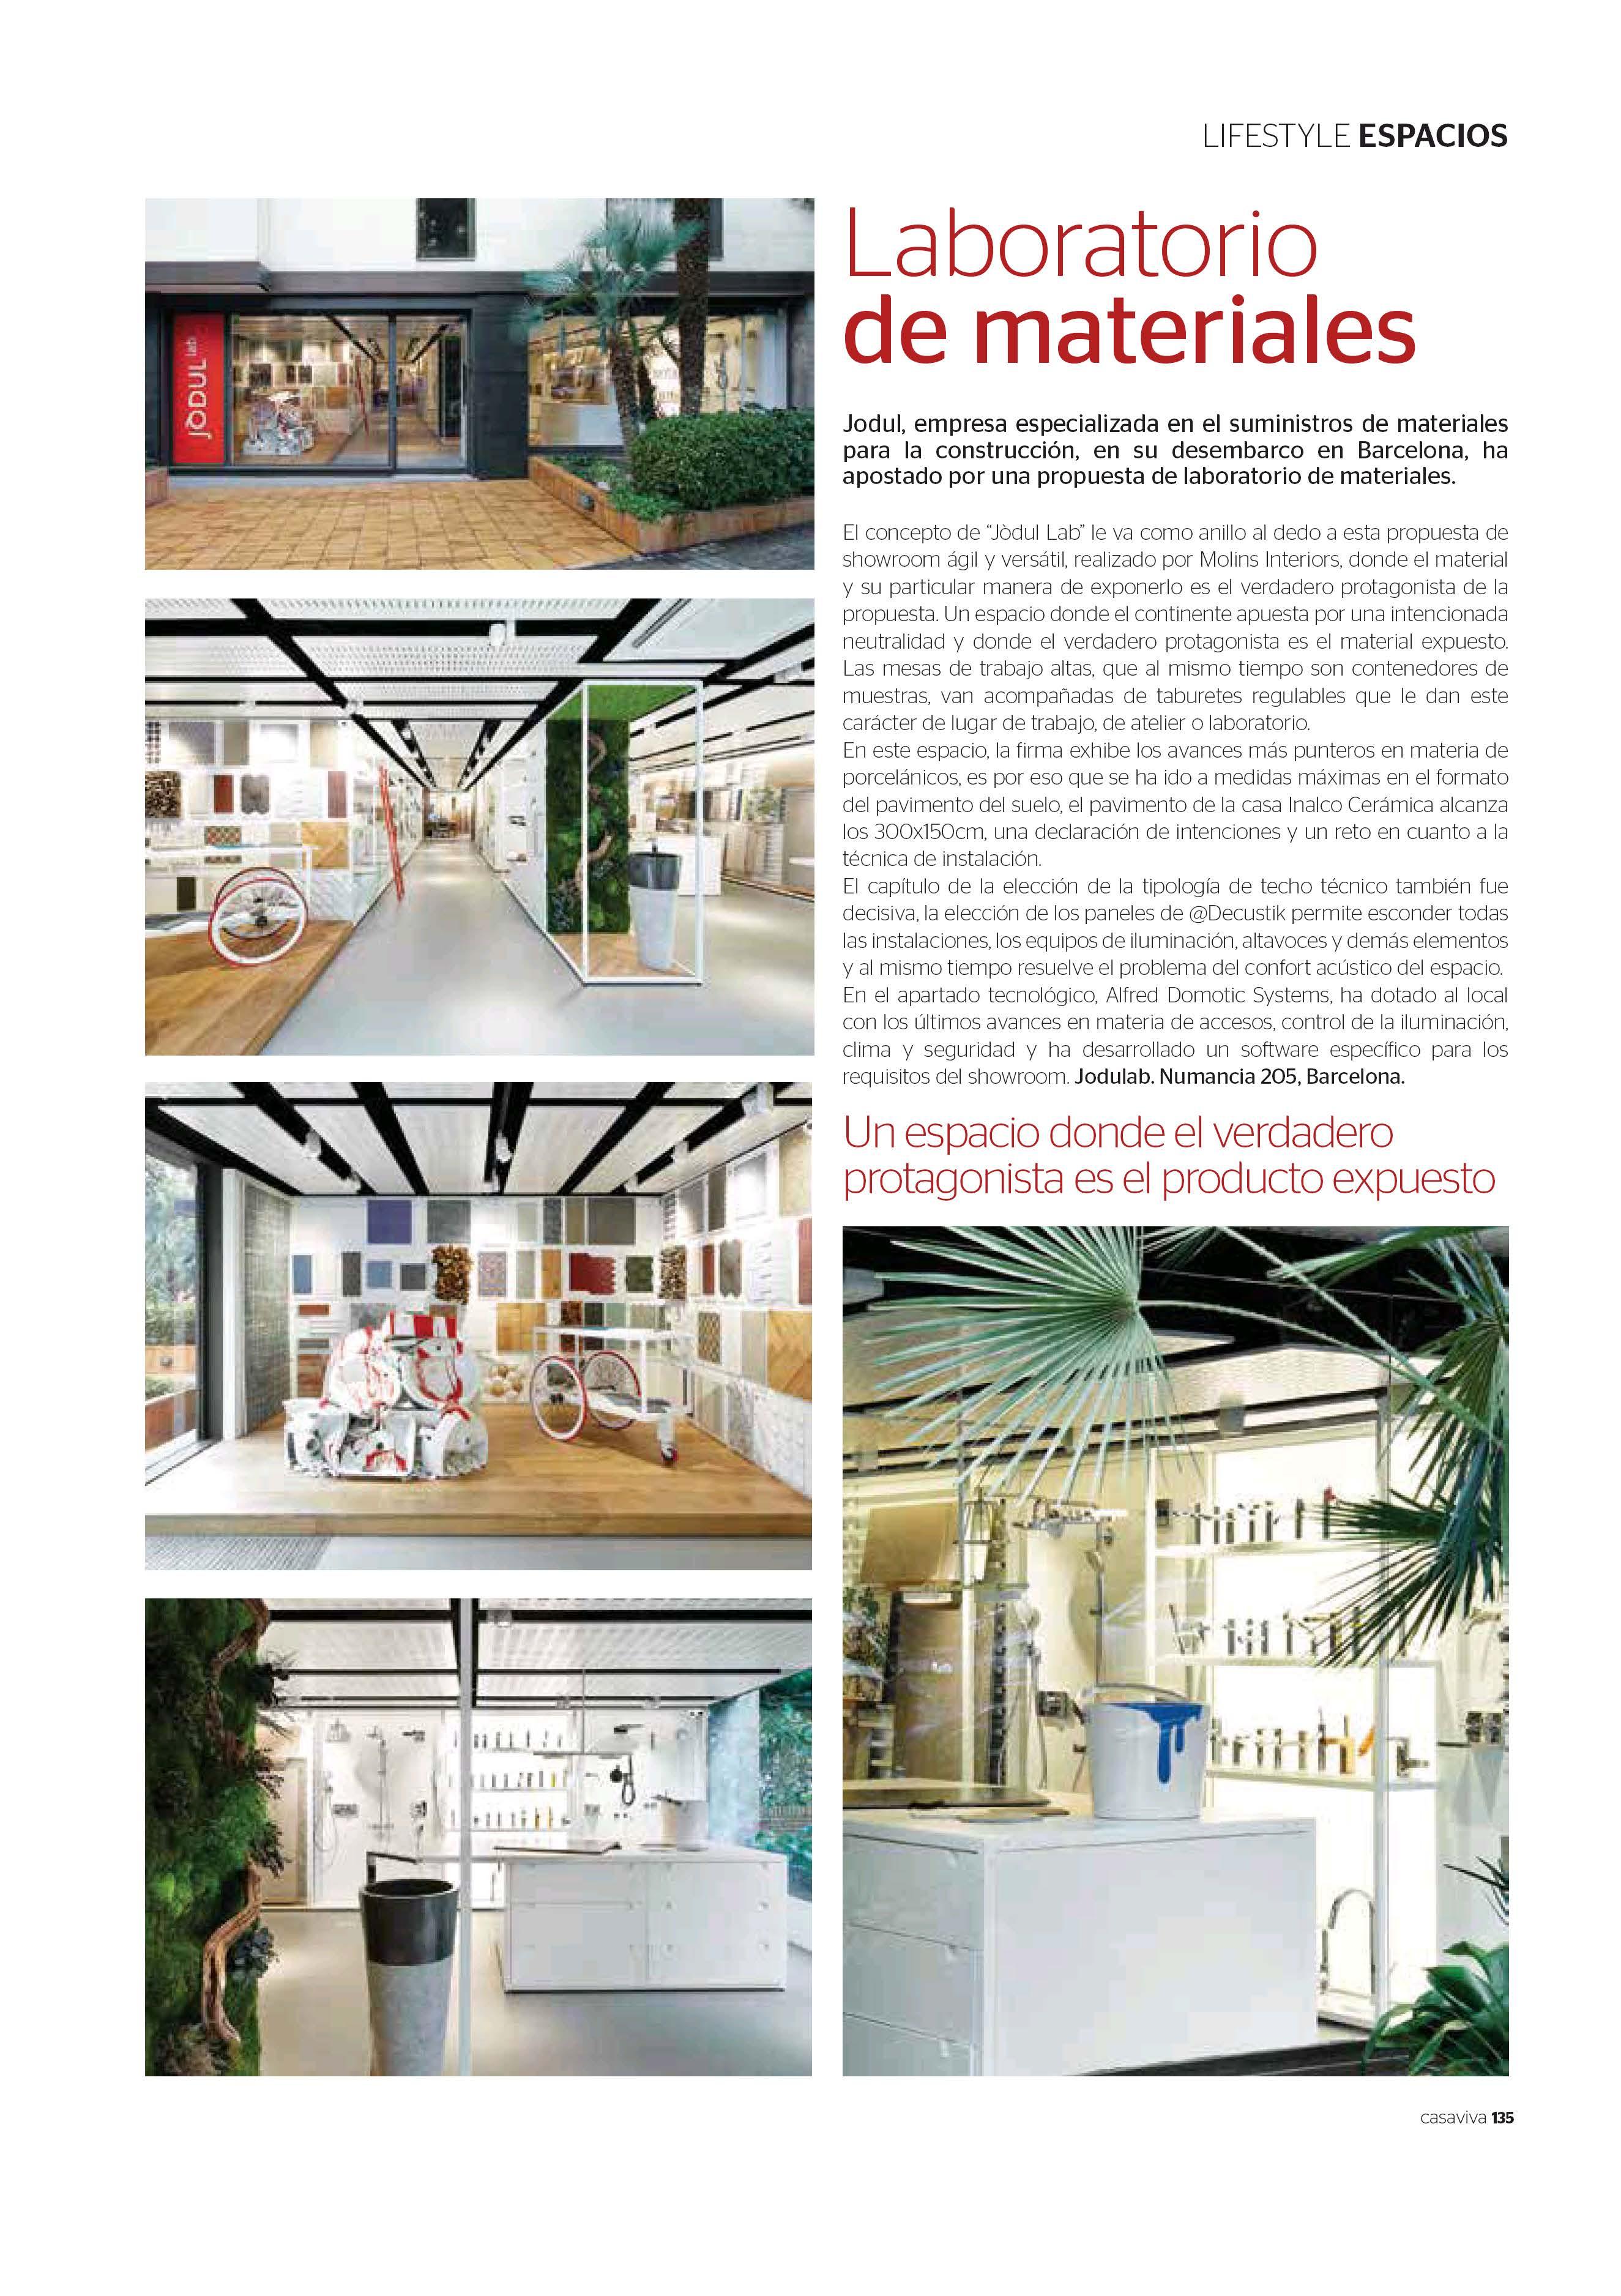 https://whiterabbit.es/wp-content/uploads/2017/06/Revista_Casa-Viva-1.jpg